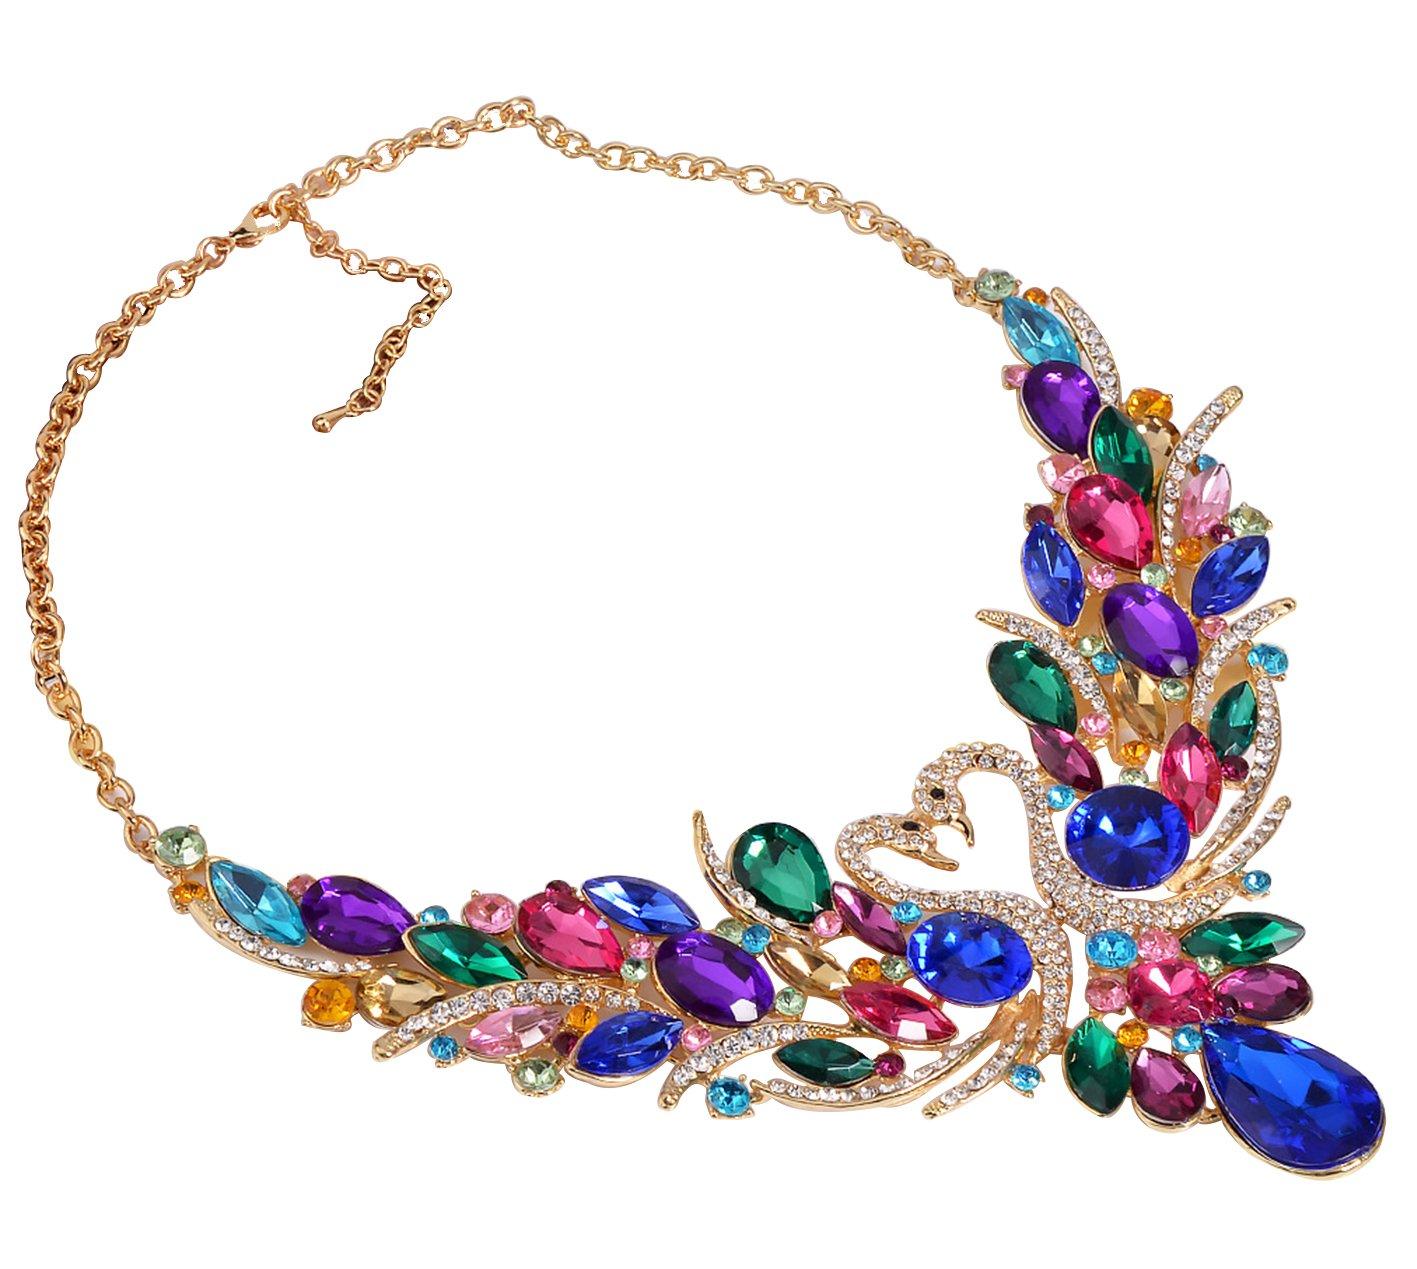 SEKAISORA Fashion Elegant Fine Diamond Necklace Temperament With Swan Set jewelry Set Chain by SEKAISORA (Image #2)